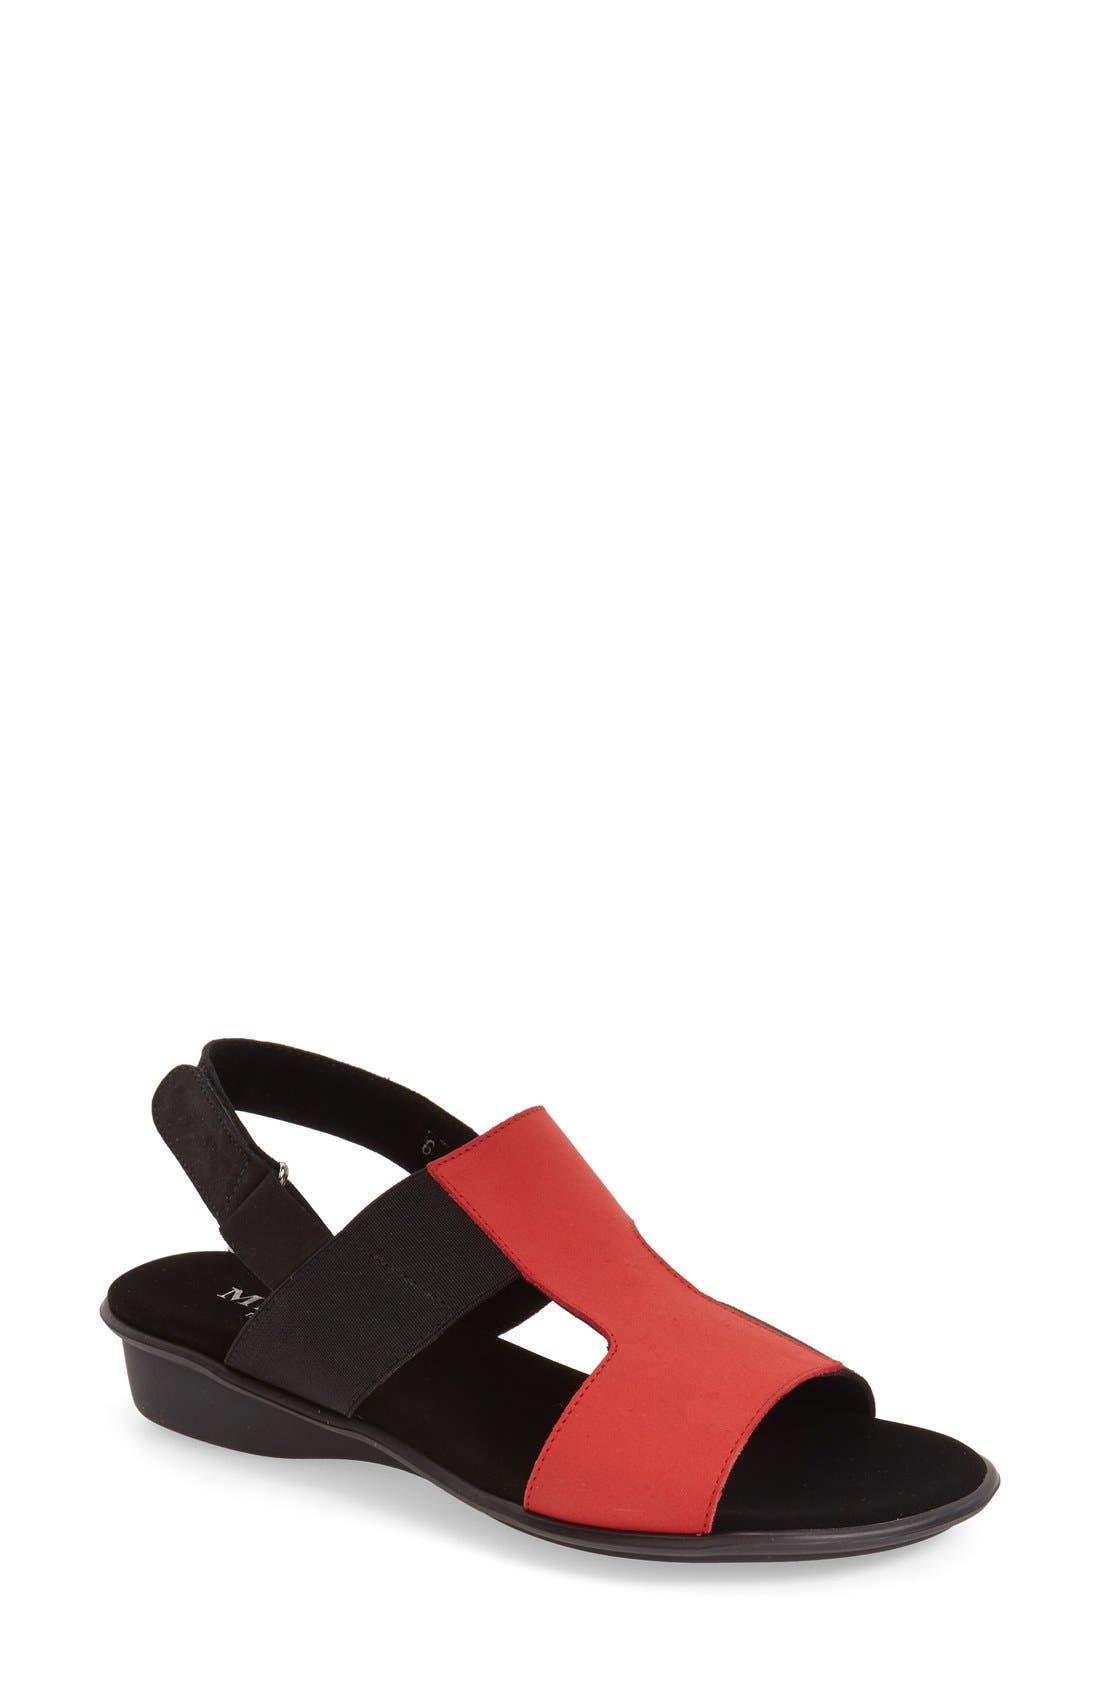 'Eudore' Slingback Sandal,                         Main,                         color, RED NUBUCK